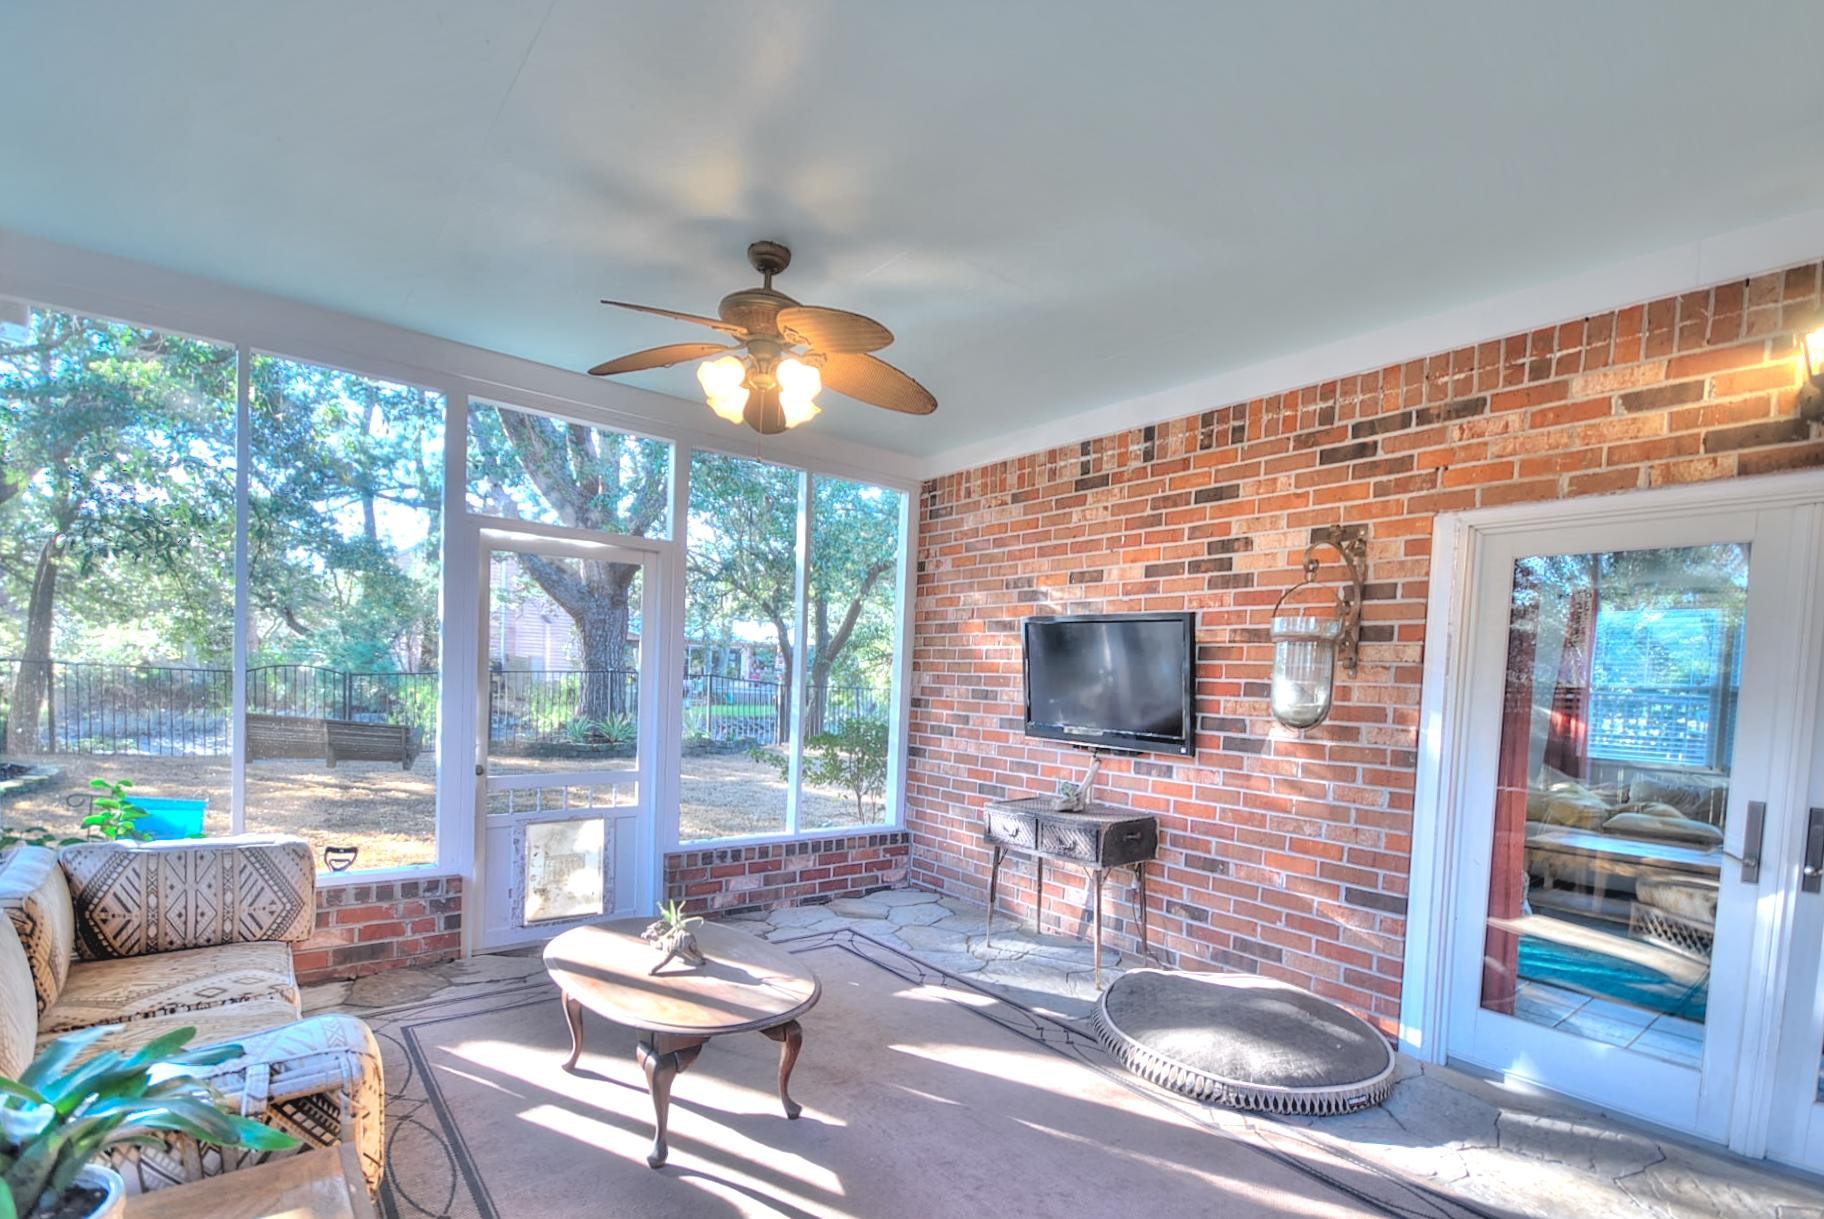 Capri Isles Homes For Sale - 213 Wappoo, Charleston, SC - 11